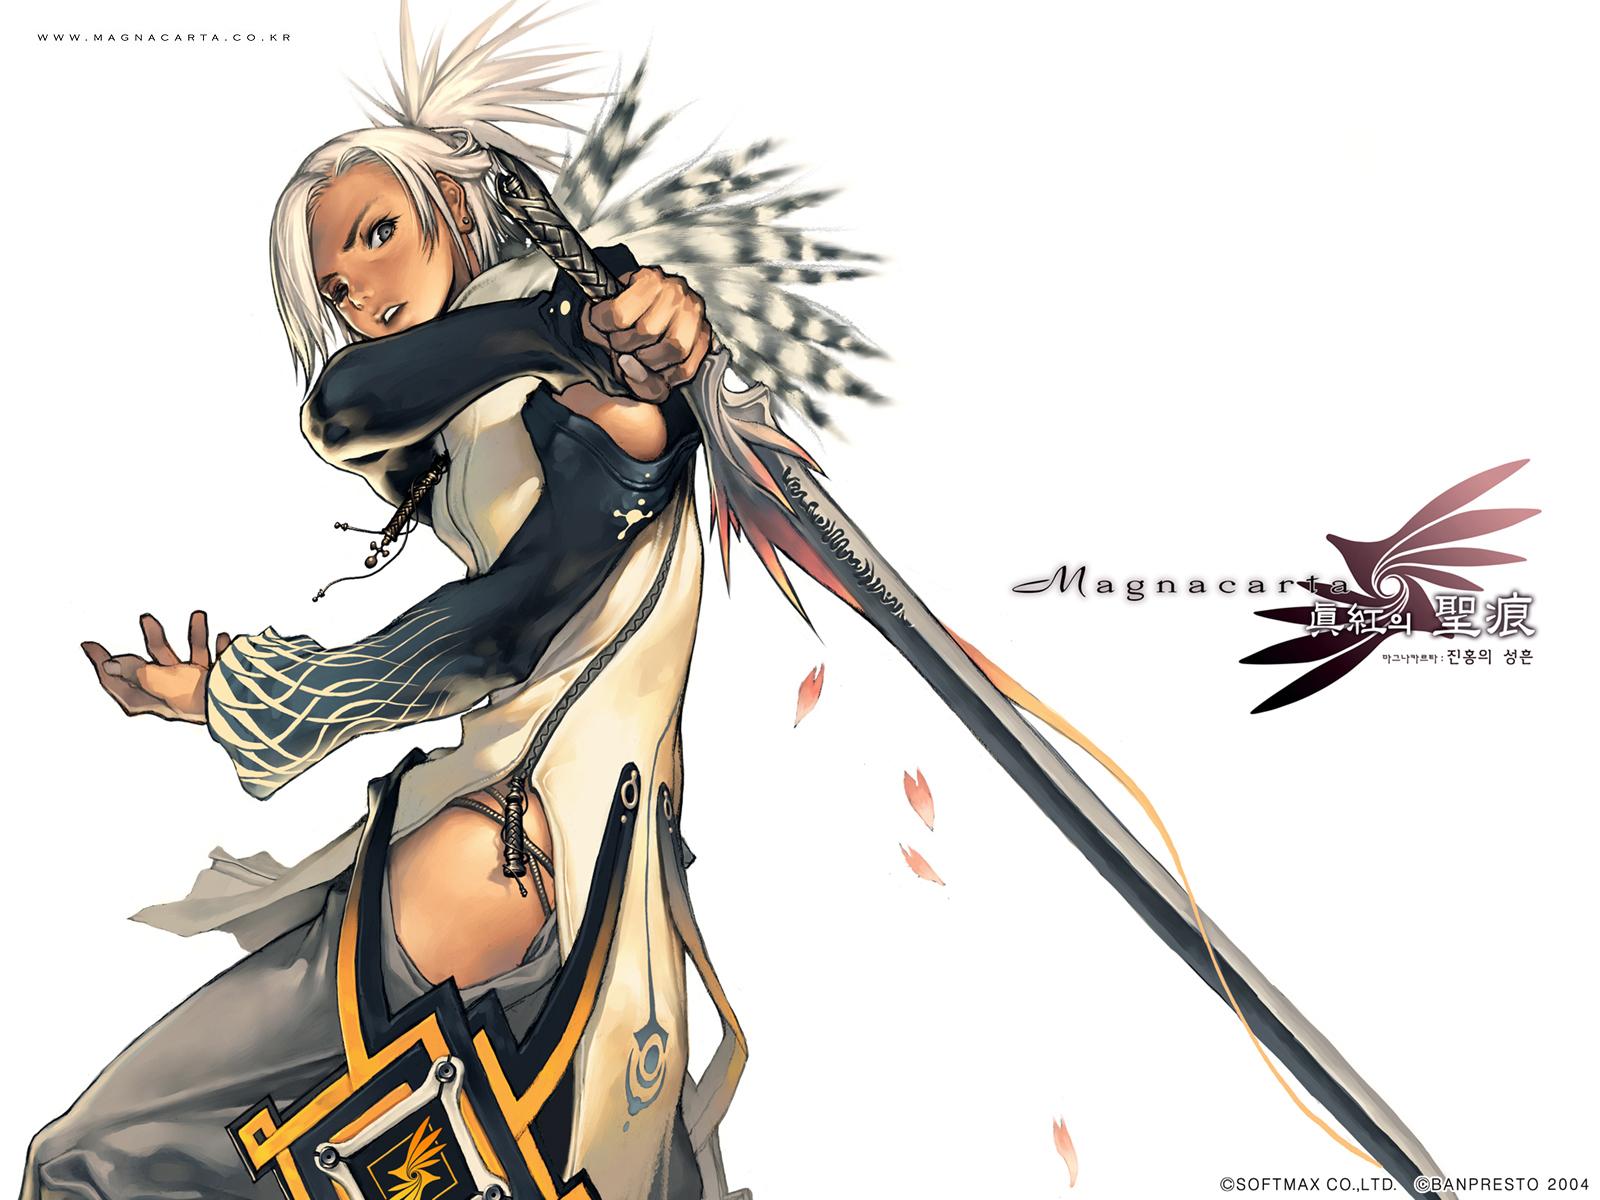 Magna Carta Anime forum